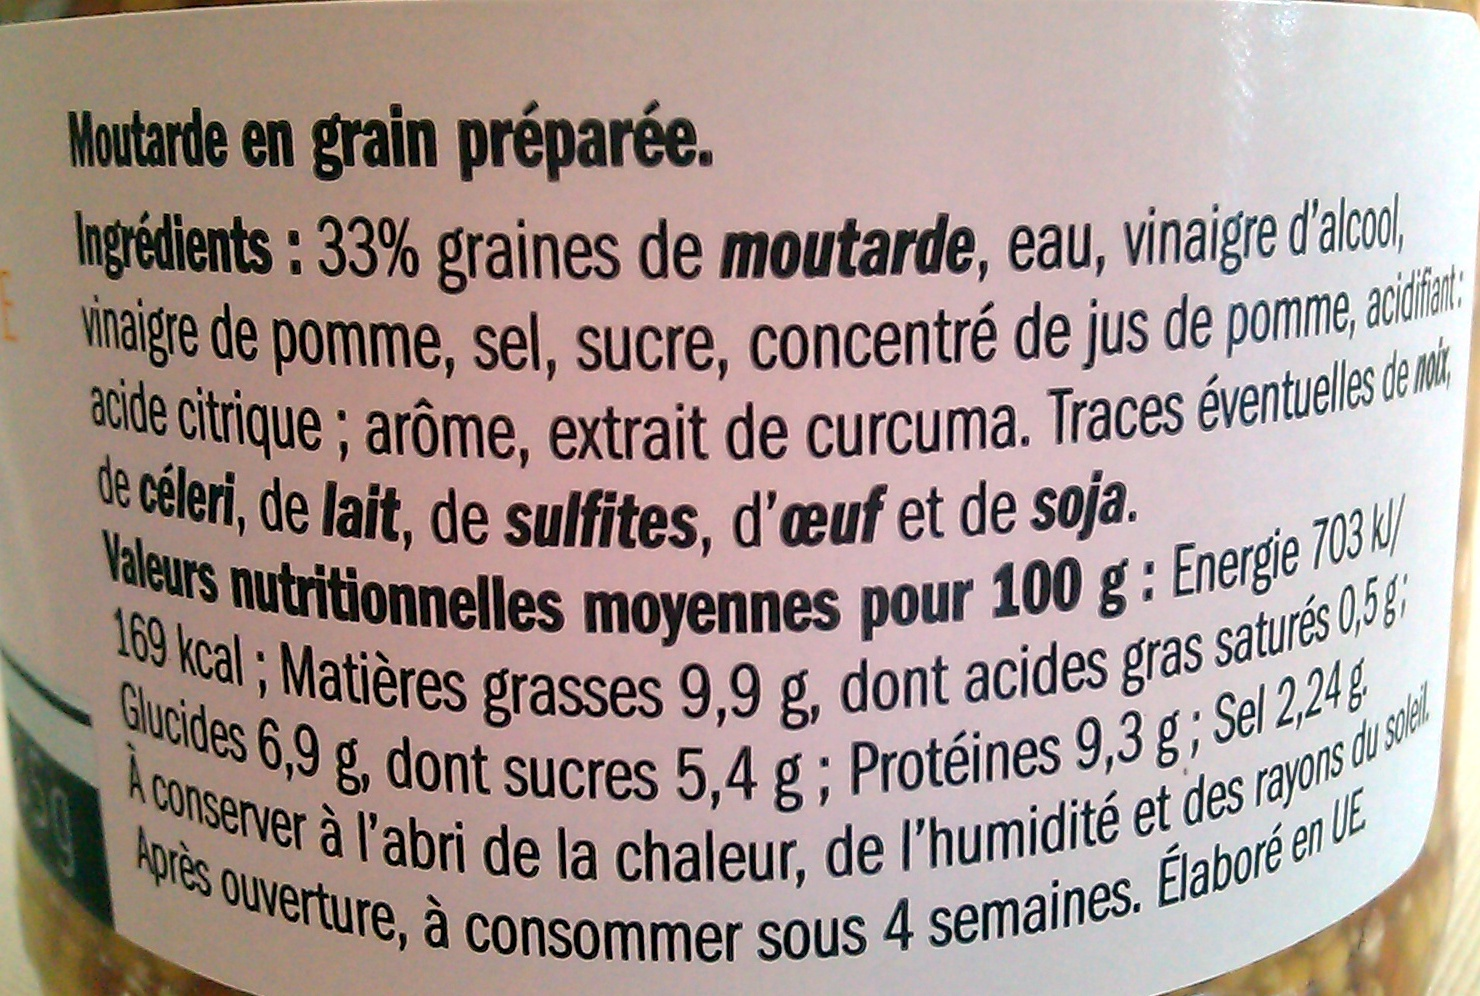 Moutarde en grain préparée - Ingrediënten